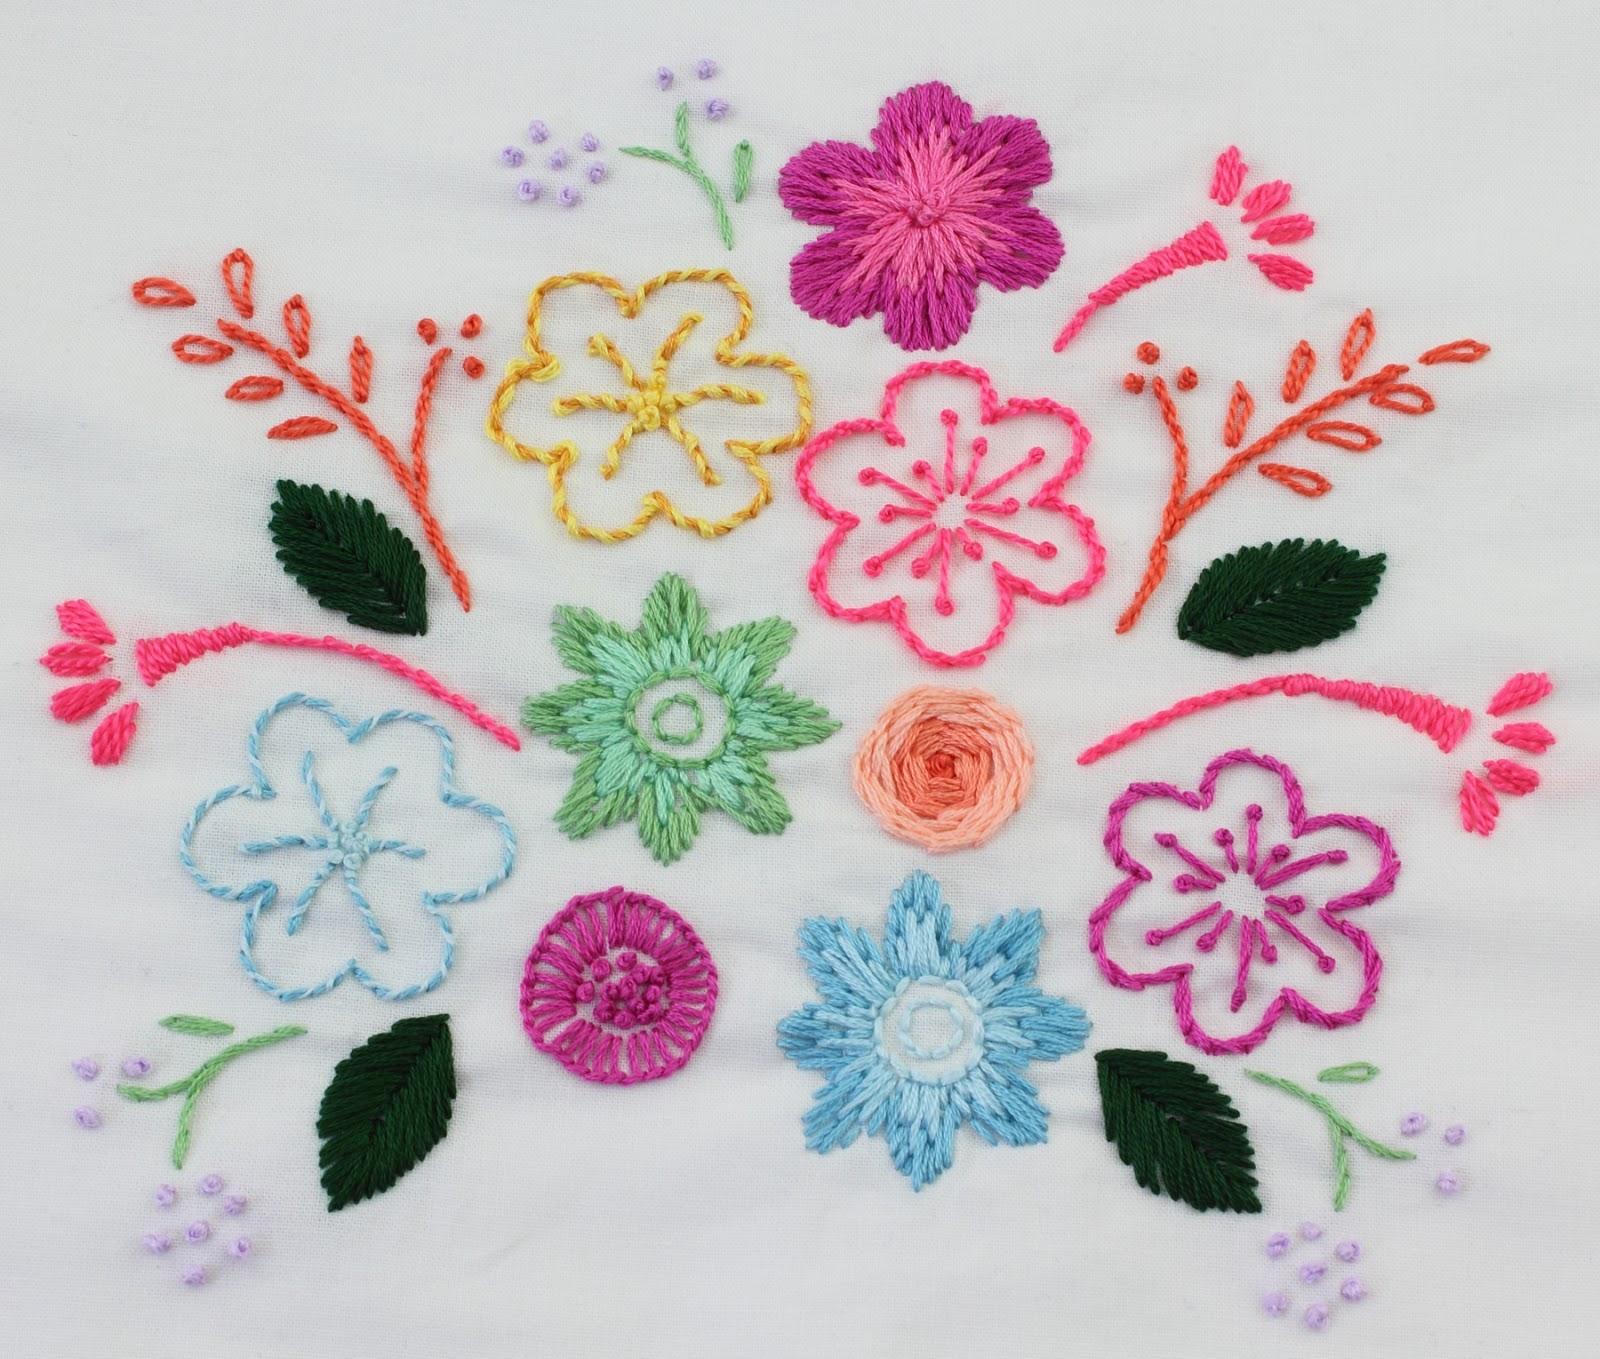 Daisy Flower Stitch N/ähmaschine N/ähfu/ß f/ür alle Low Shank S/änger Janome Brother BIOBEY Flower Stitch N/ähfu/ß